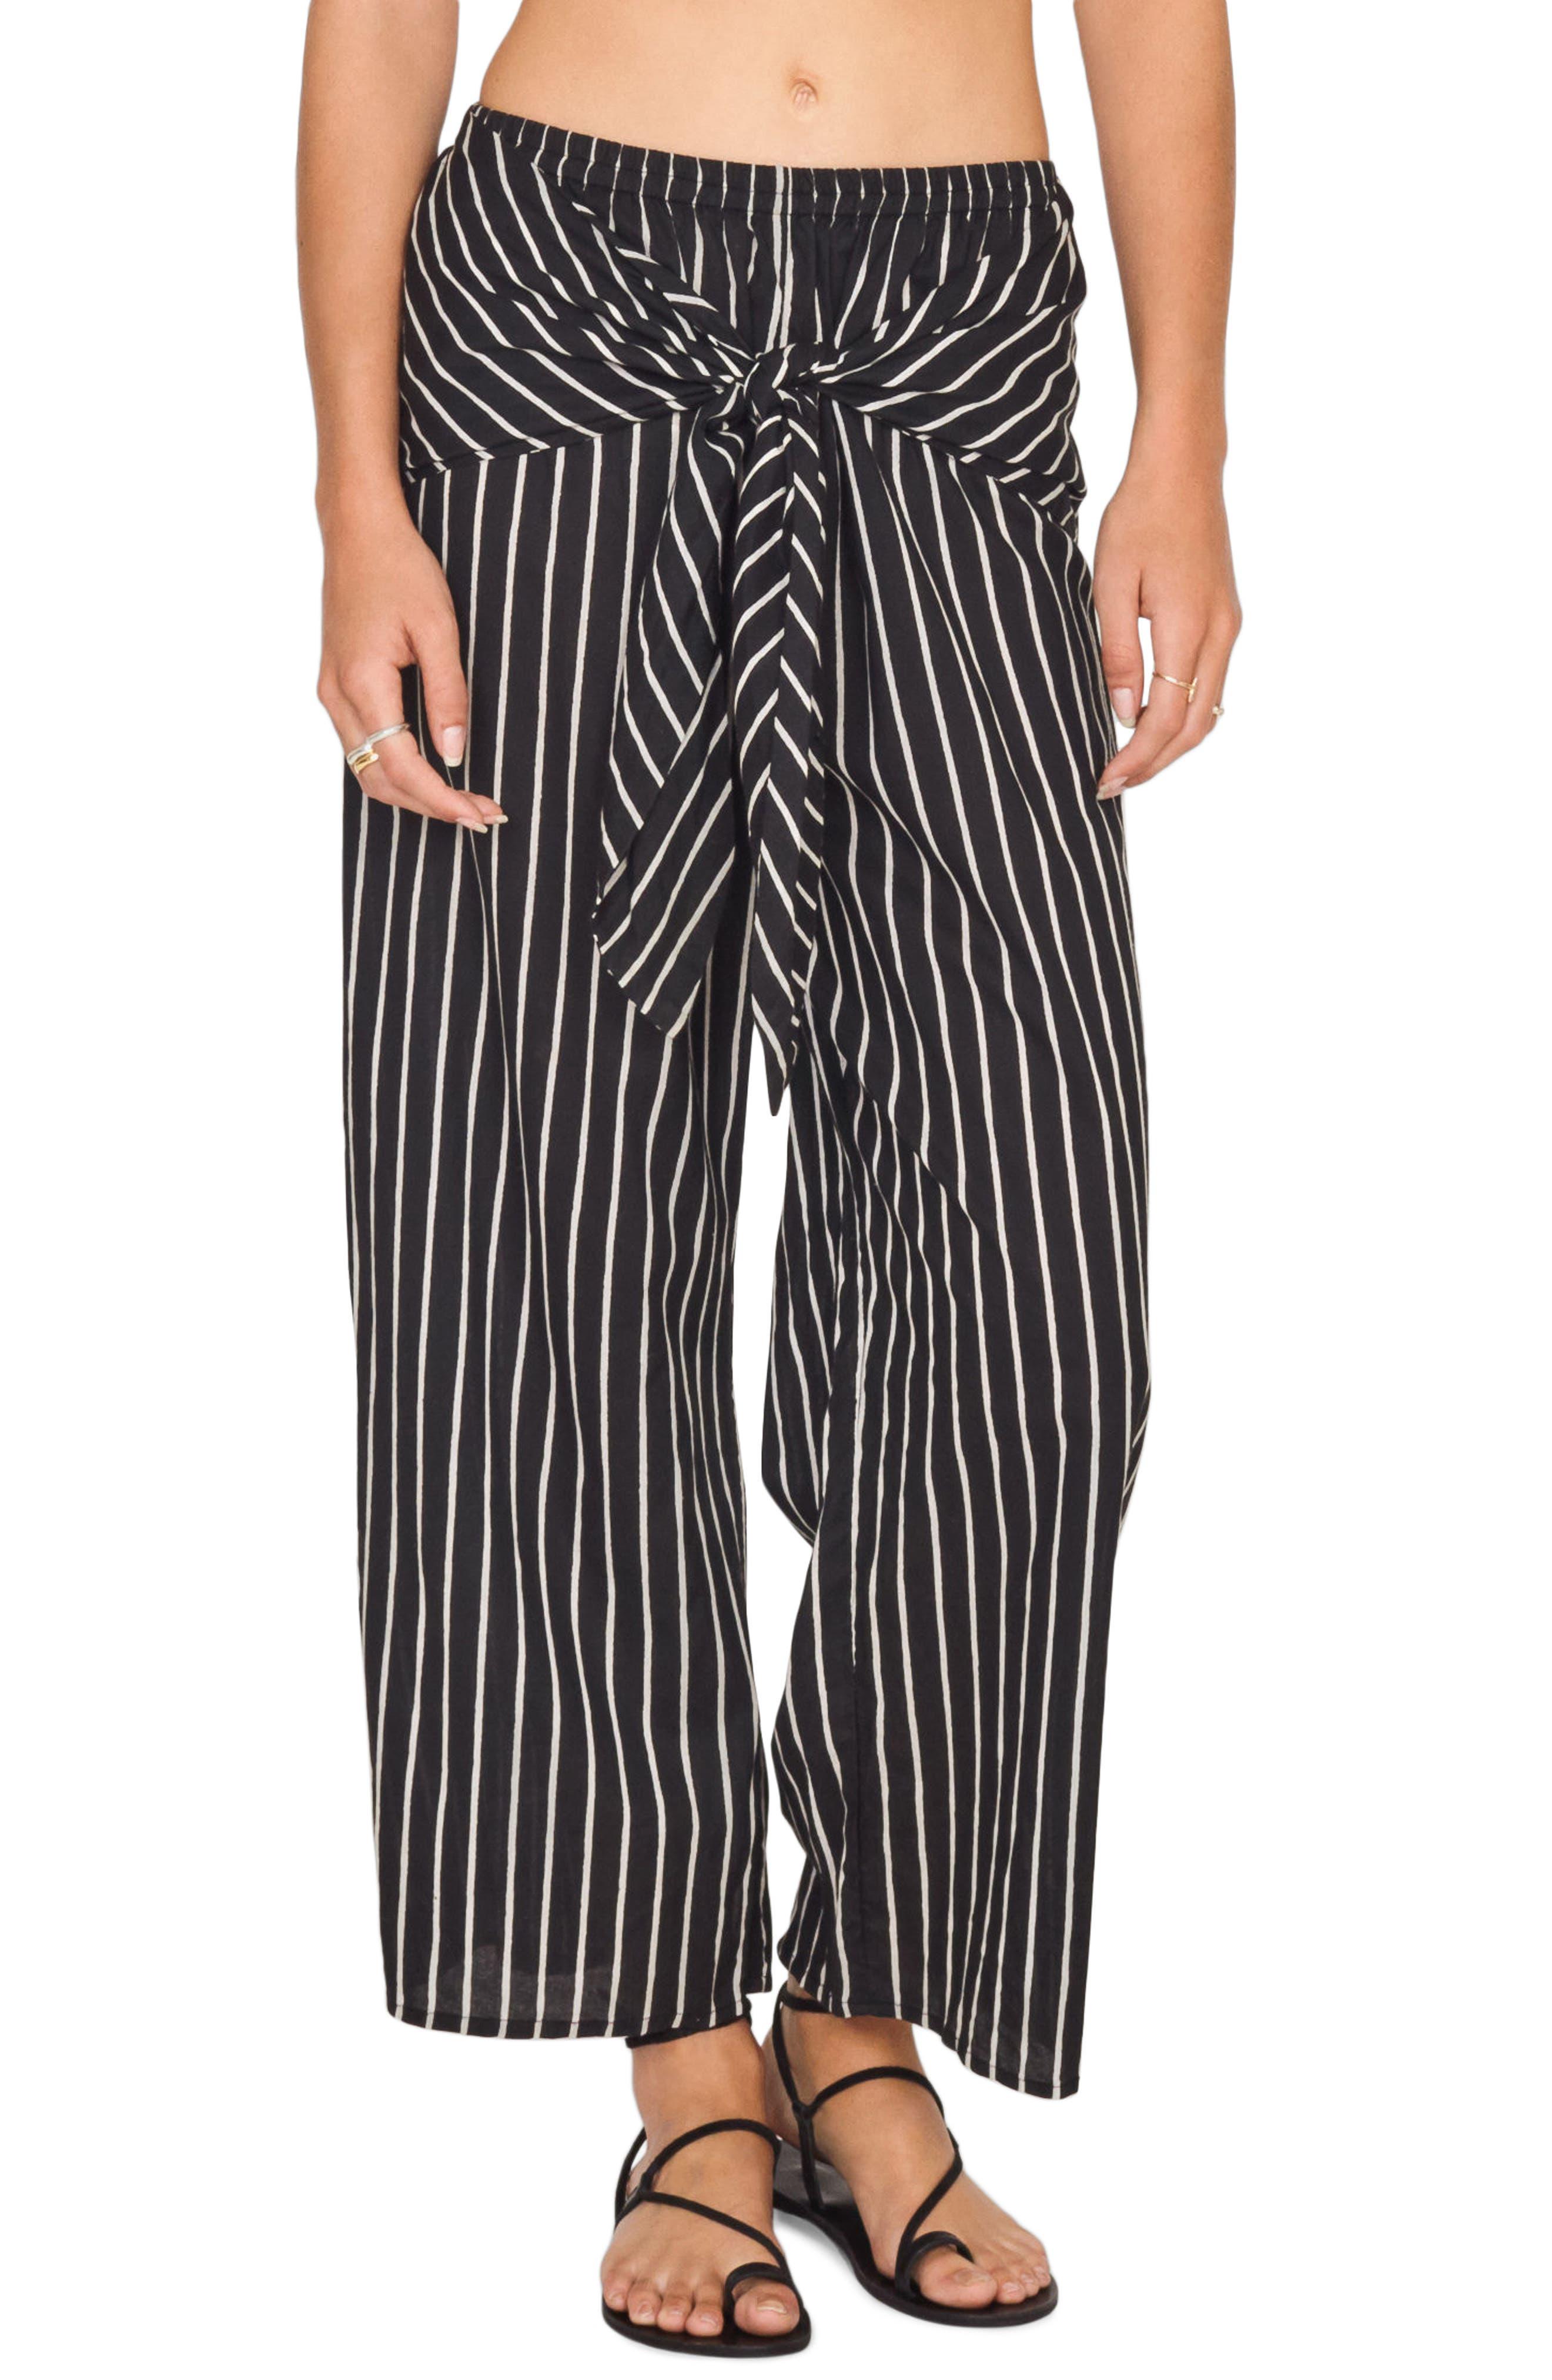 Blurred Lines Knot Front Pants,                             Main thumbnail 1, color,                             Black Sands